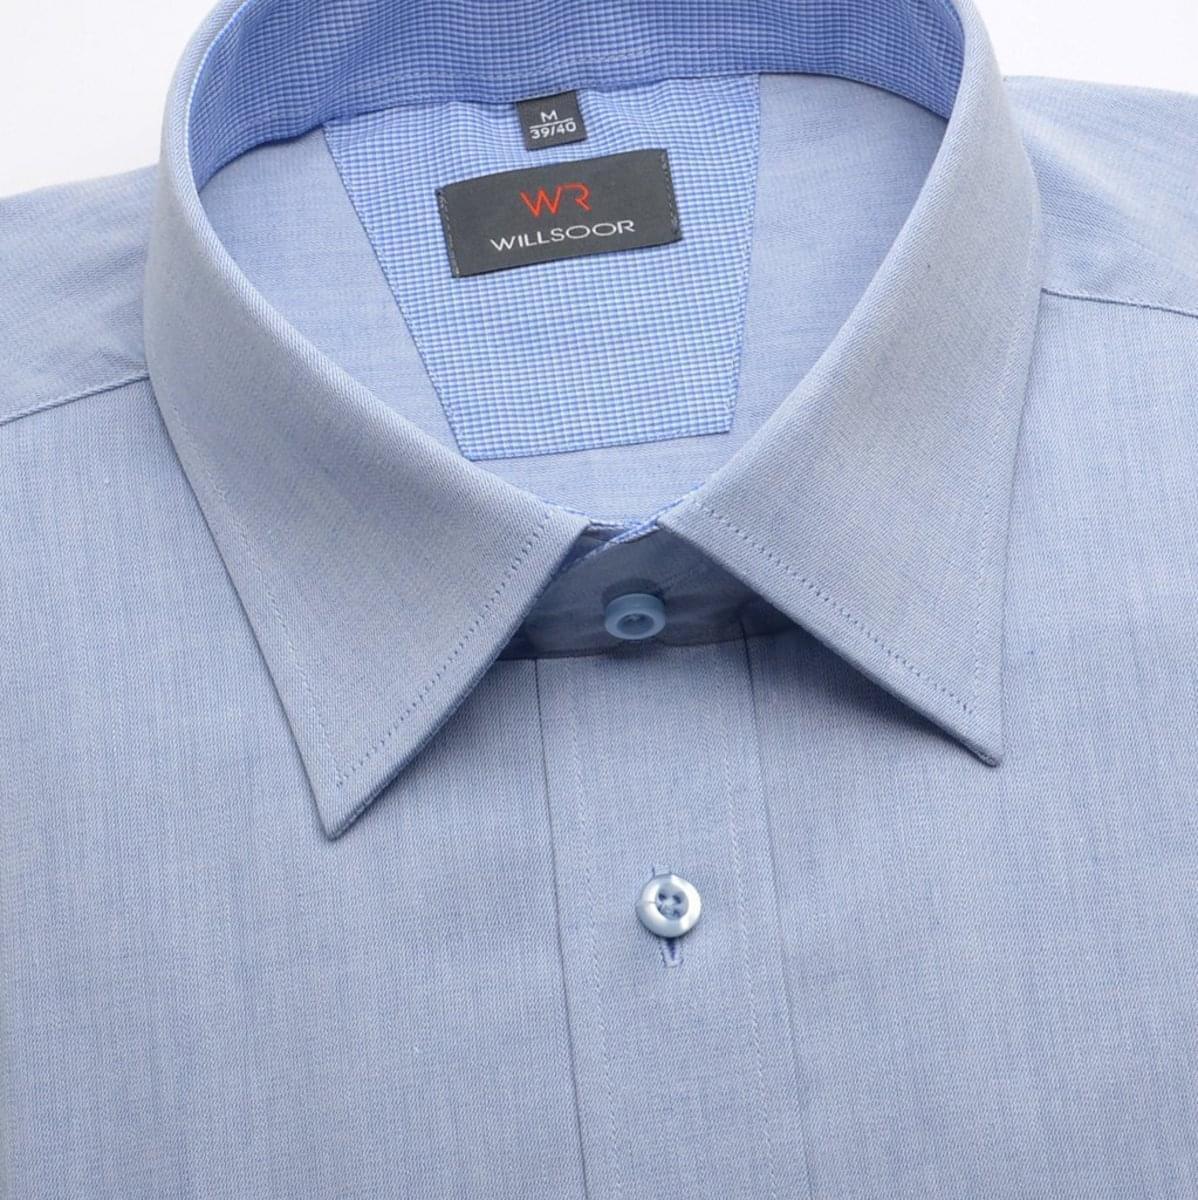 Willsoor Pánská košile WR Classic (výška 176-182) 1589 176-182 / L (41/42)